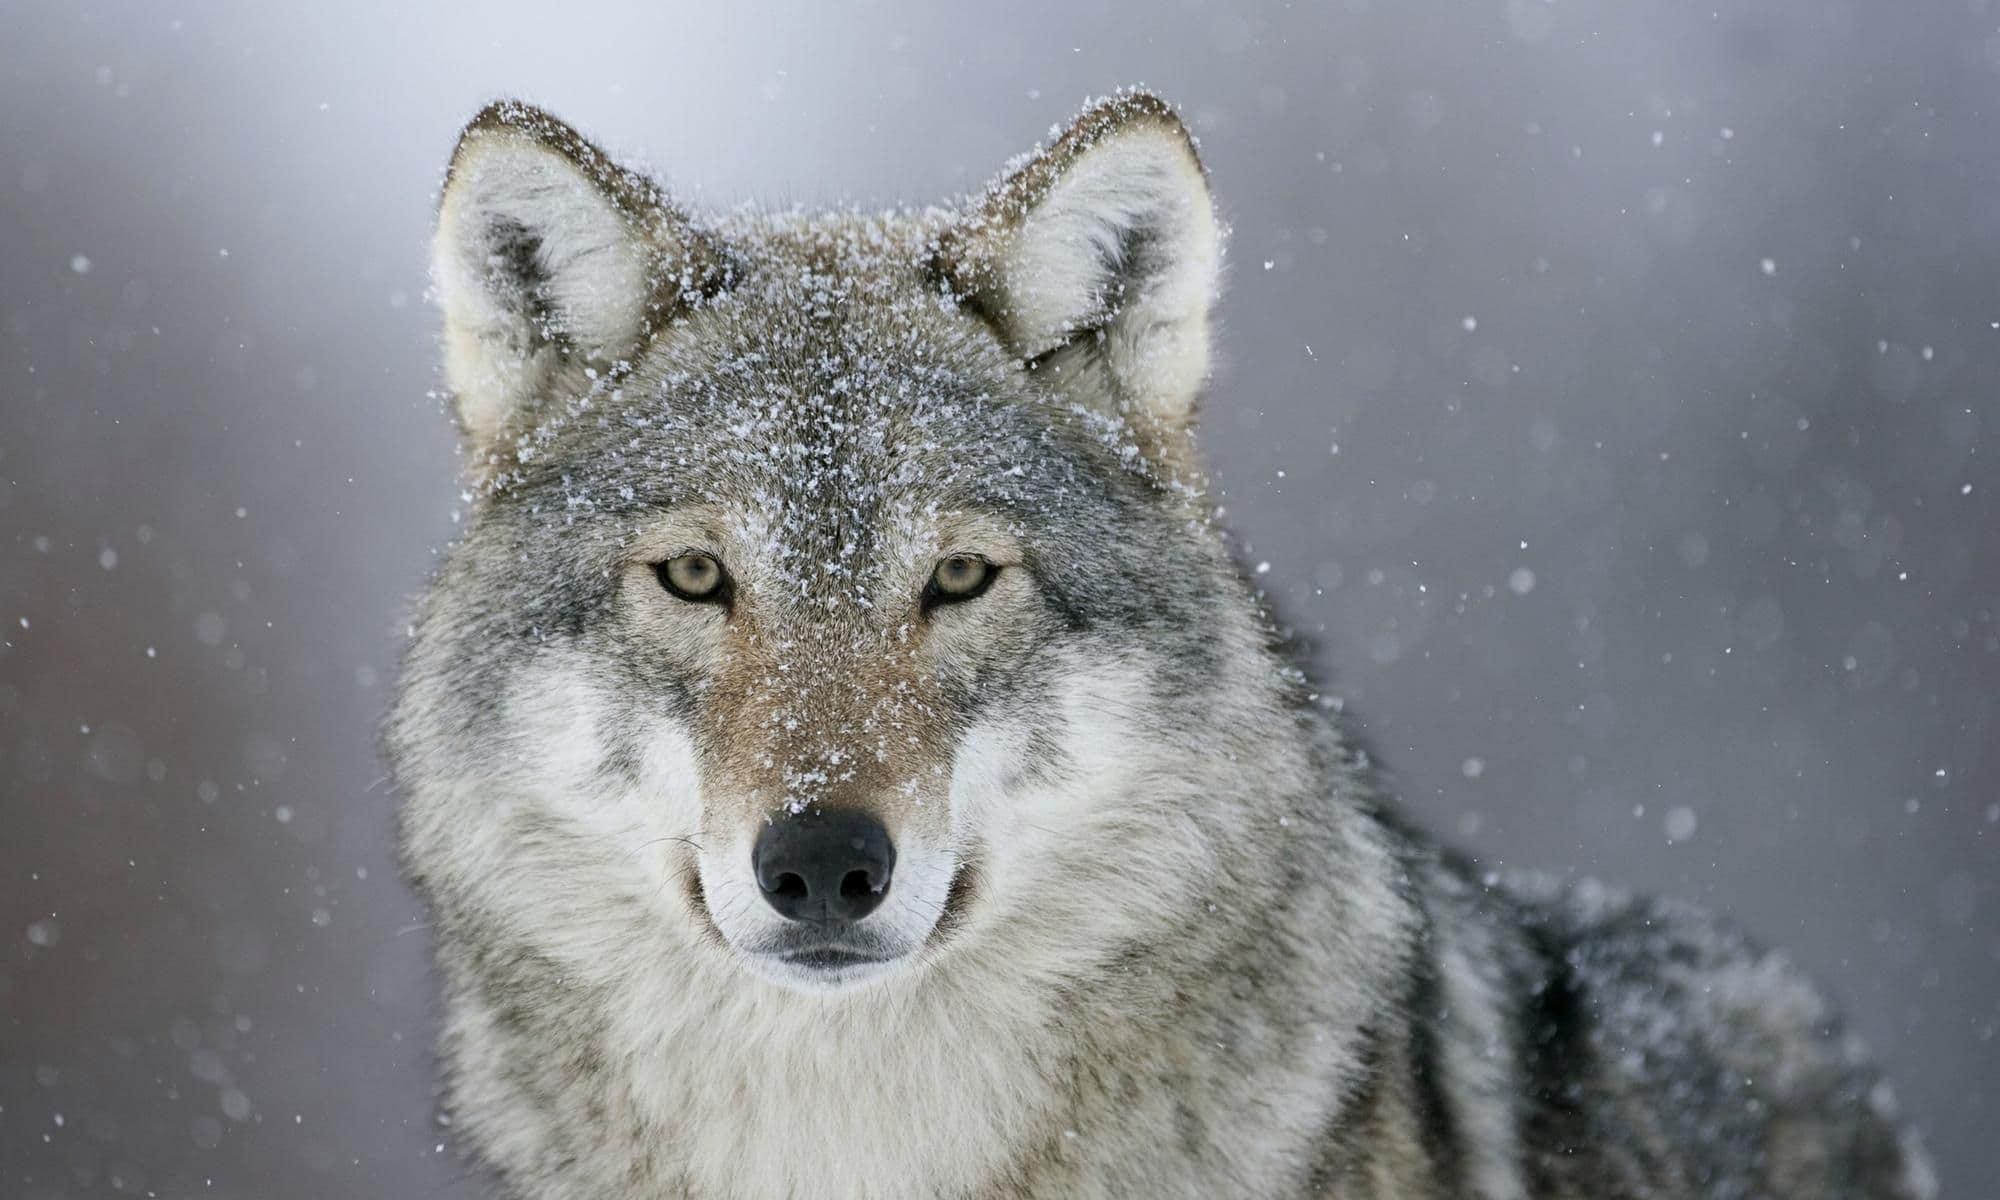 wolf dream meaning, dream about wolf, wolf dream interpretation, seeing in a dream wolf